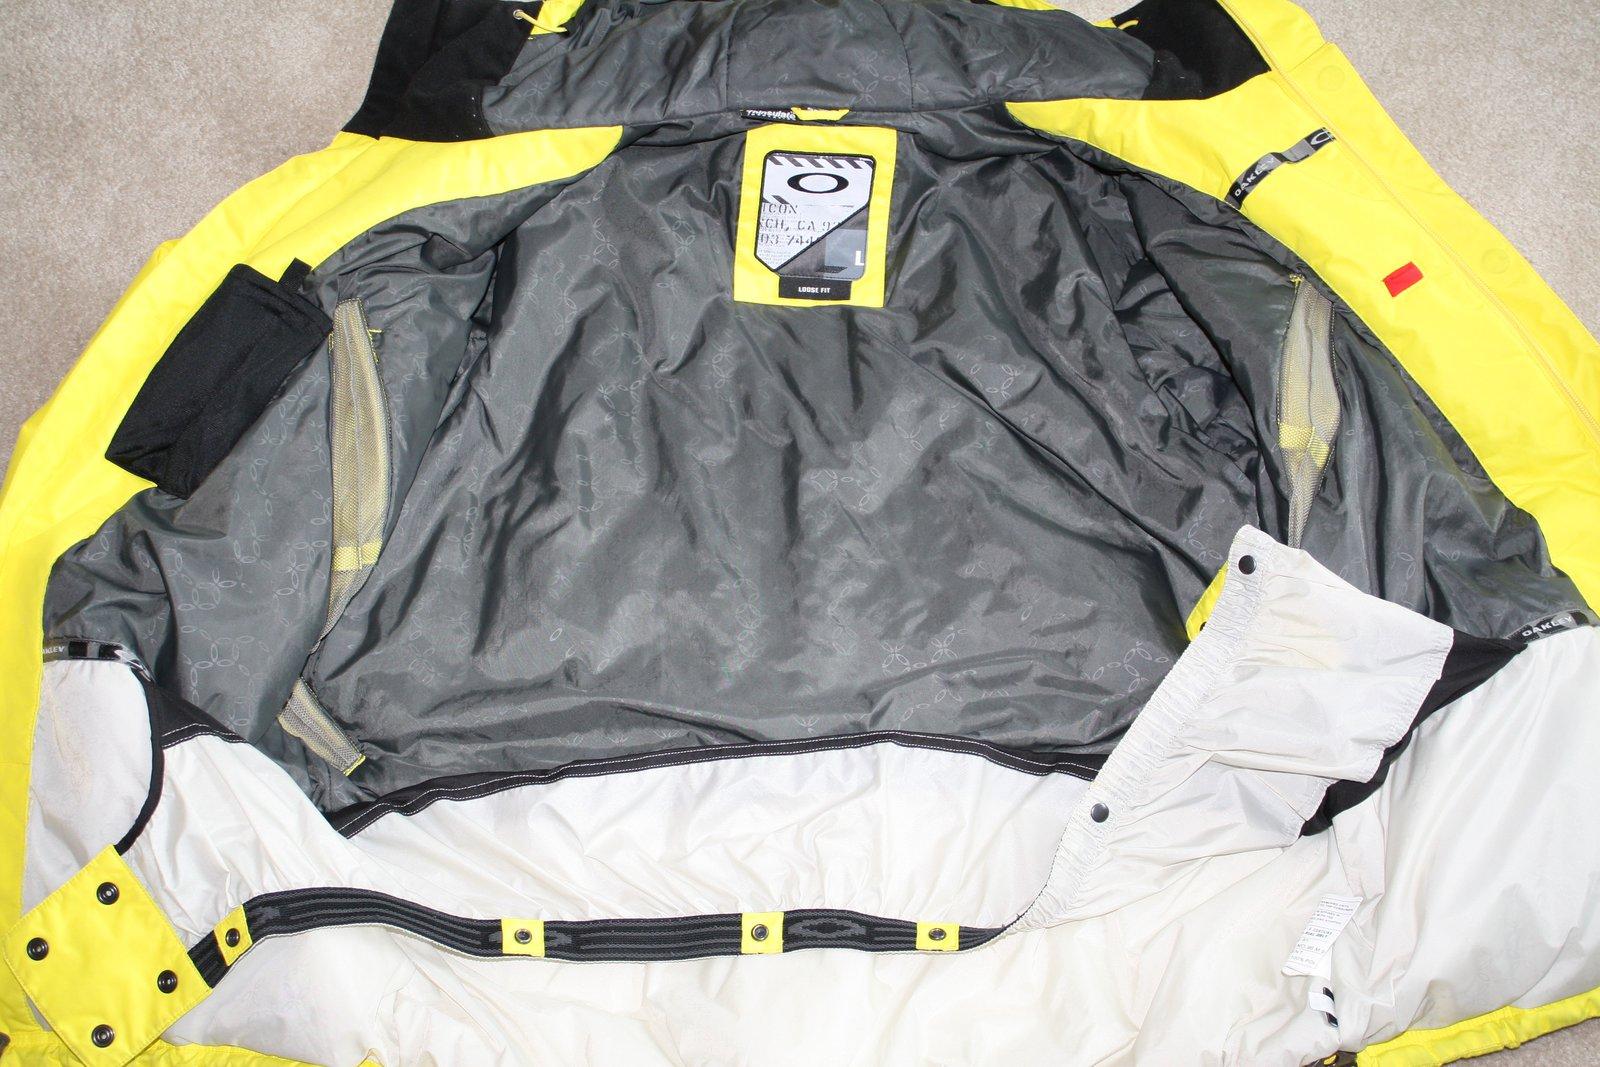 Inside coat